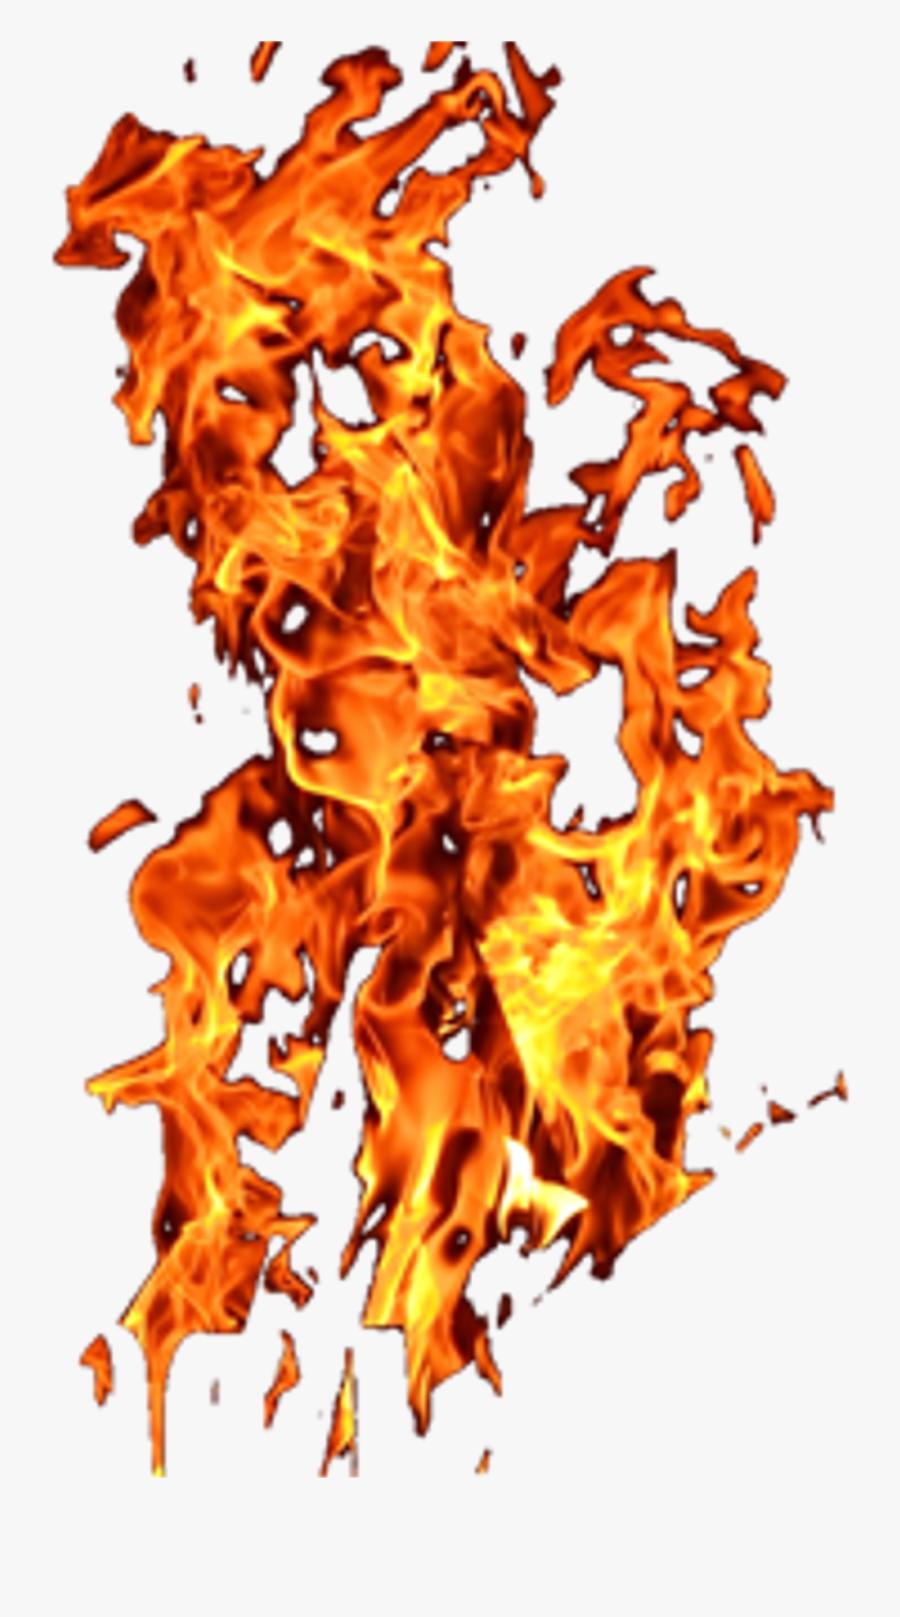 Match Clipart Fire Spark - Portable Network Graphics, Transparent Clipart